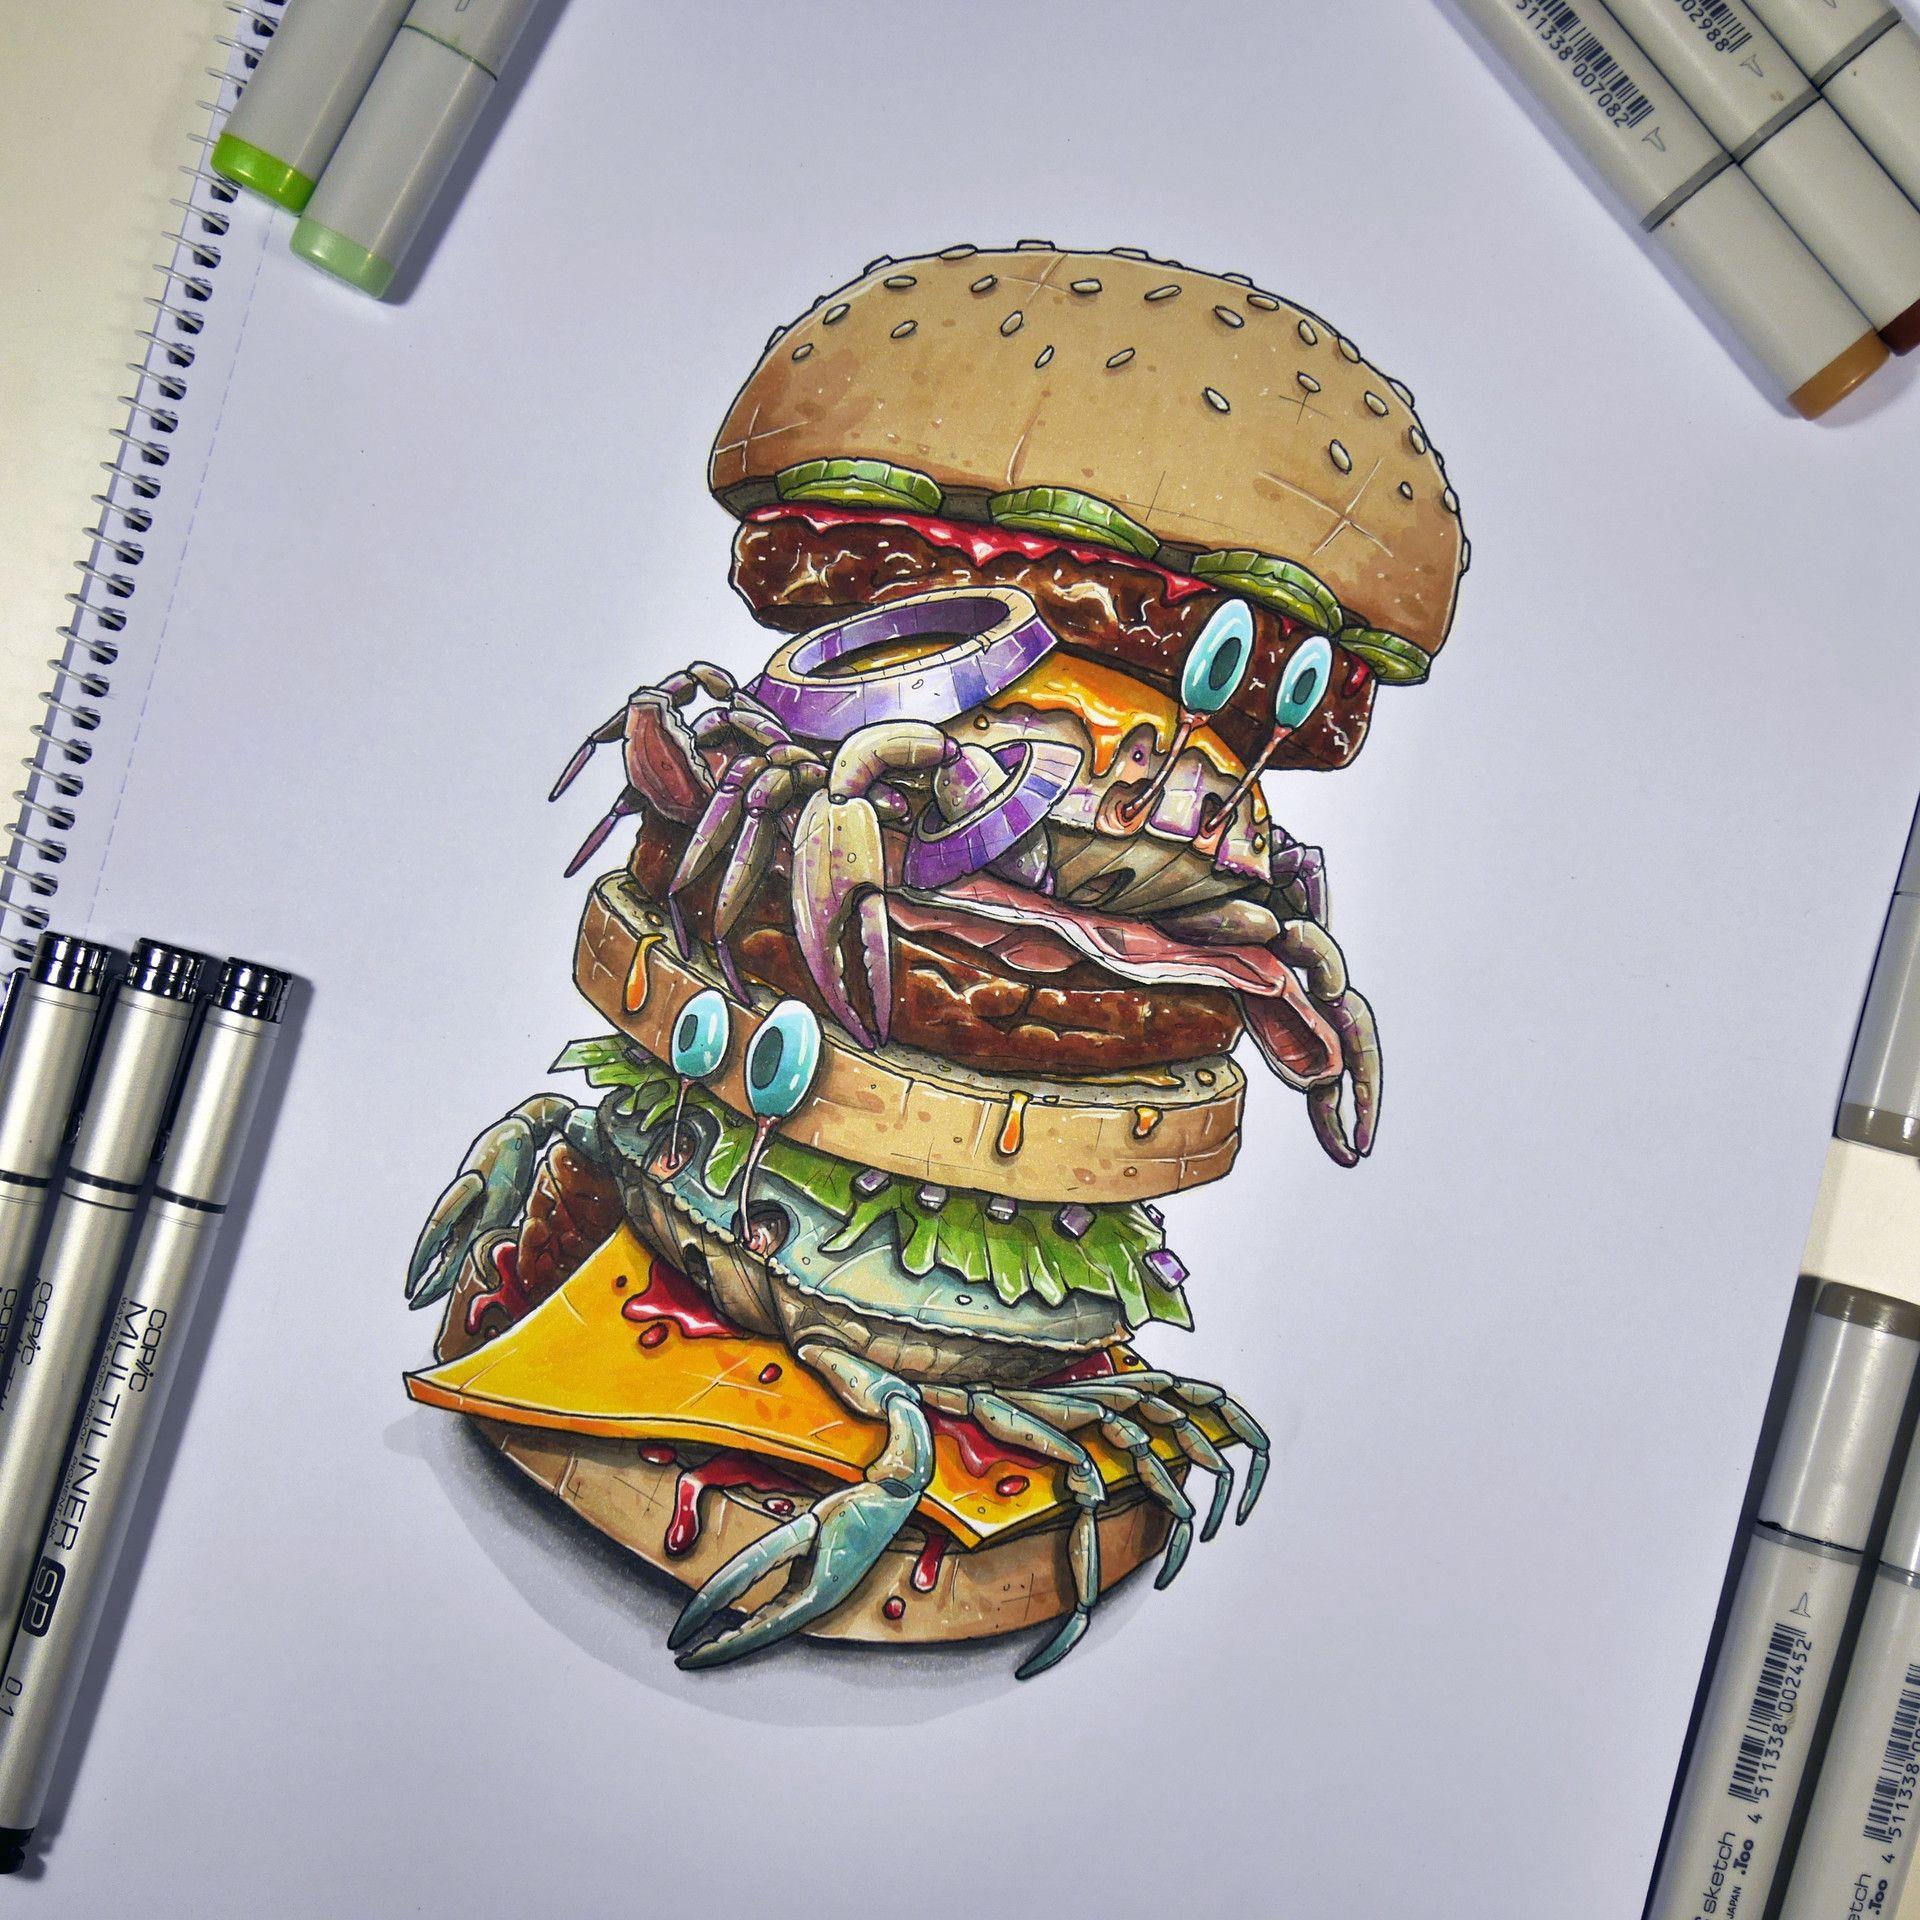 Artstation - Crabs Burger Tino Valentin Food And Beverage & In 2019